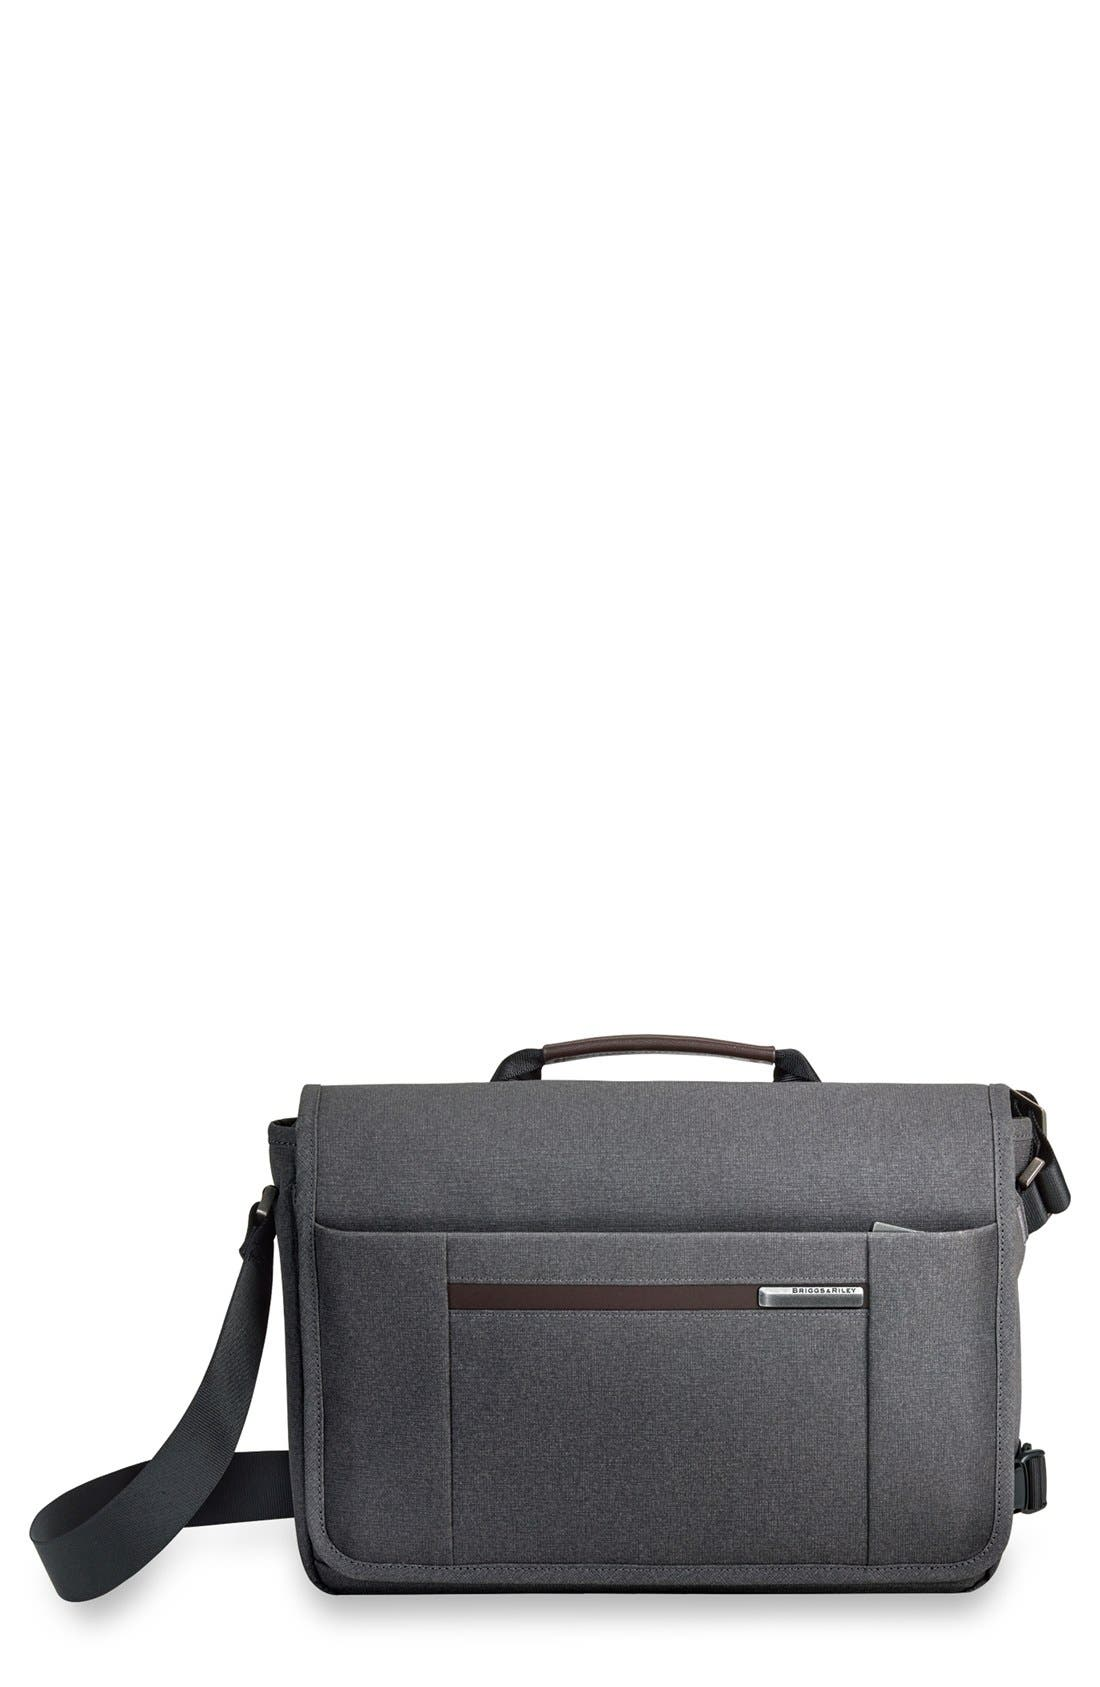 'Kinzie Street - Micro' Messenger Bag,                         Main,                         color, GREY